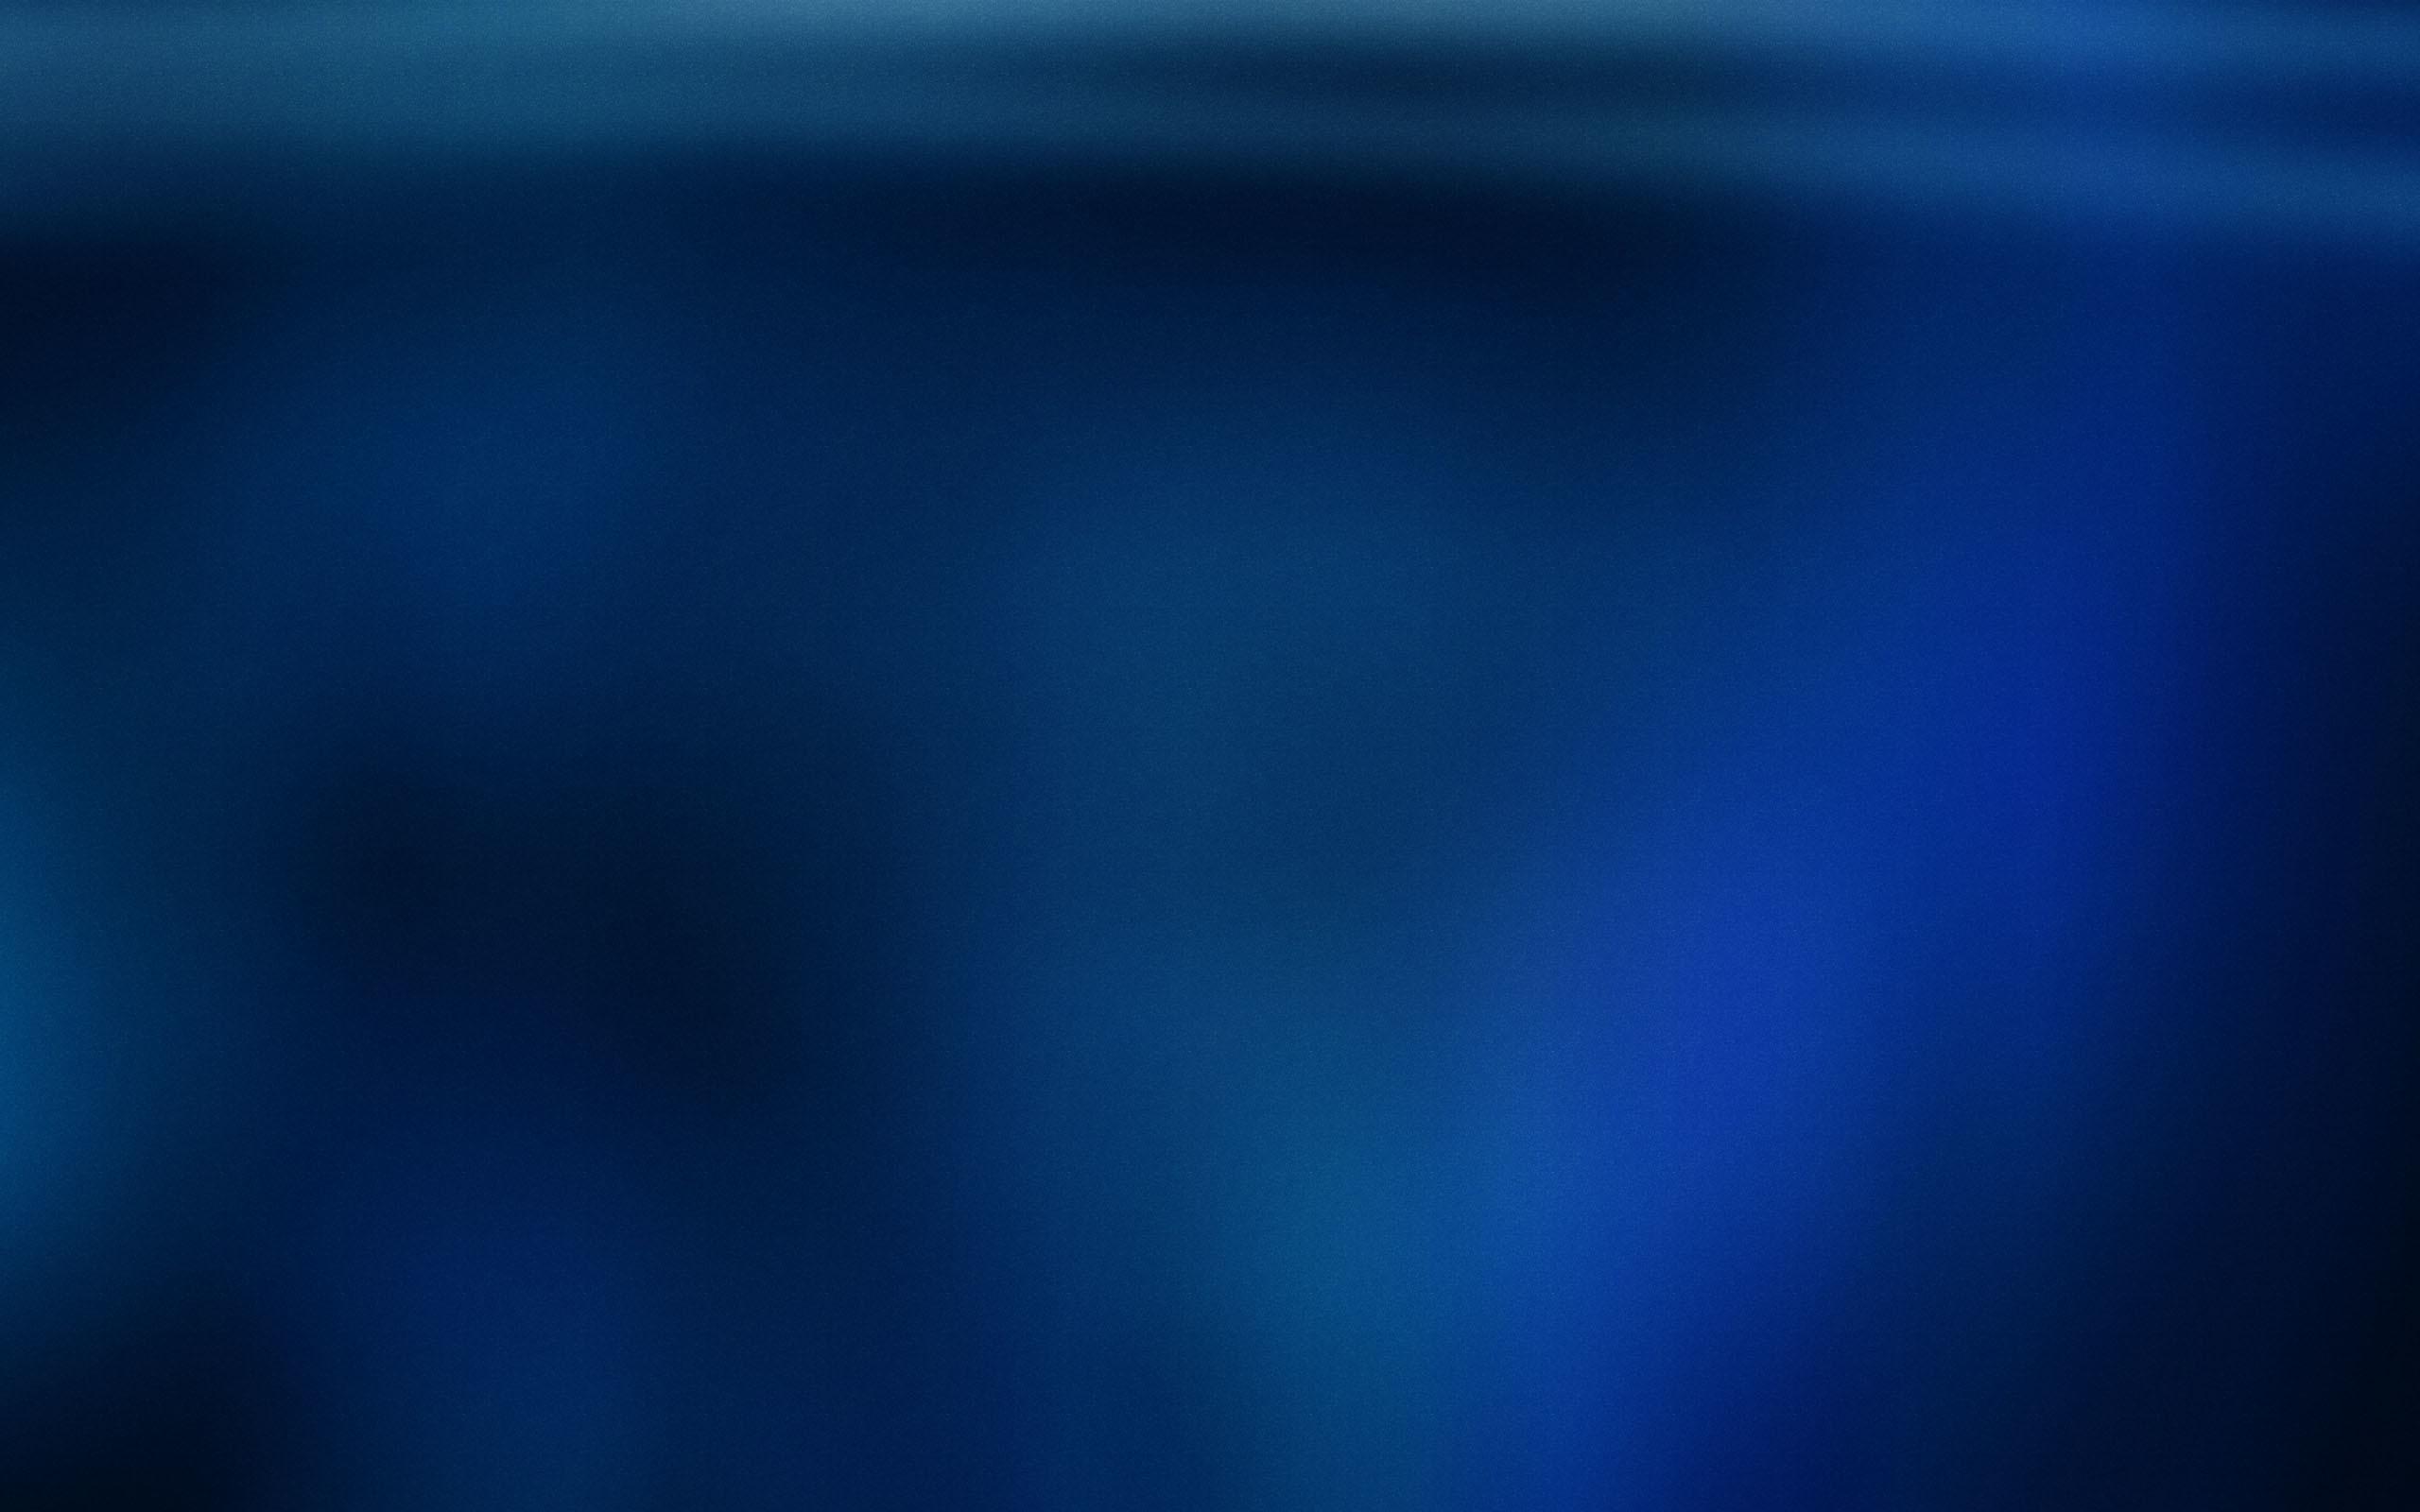 Desktop Wallpapers HD Abstract Blue Desktop Background   Mac Abstract .